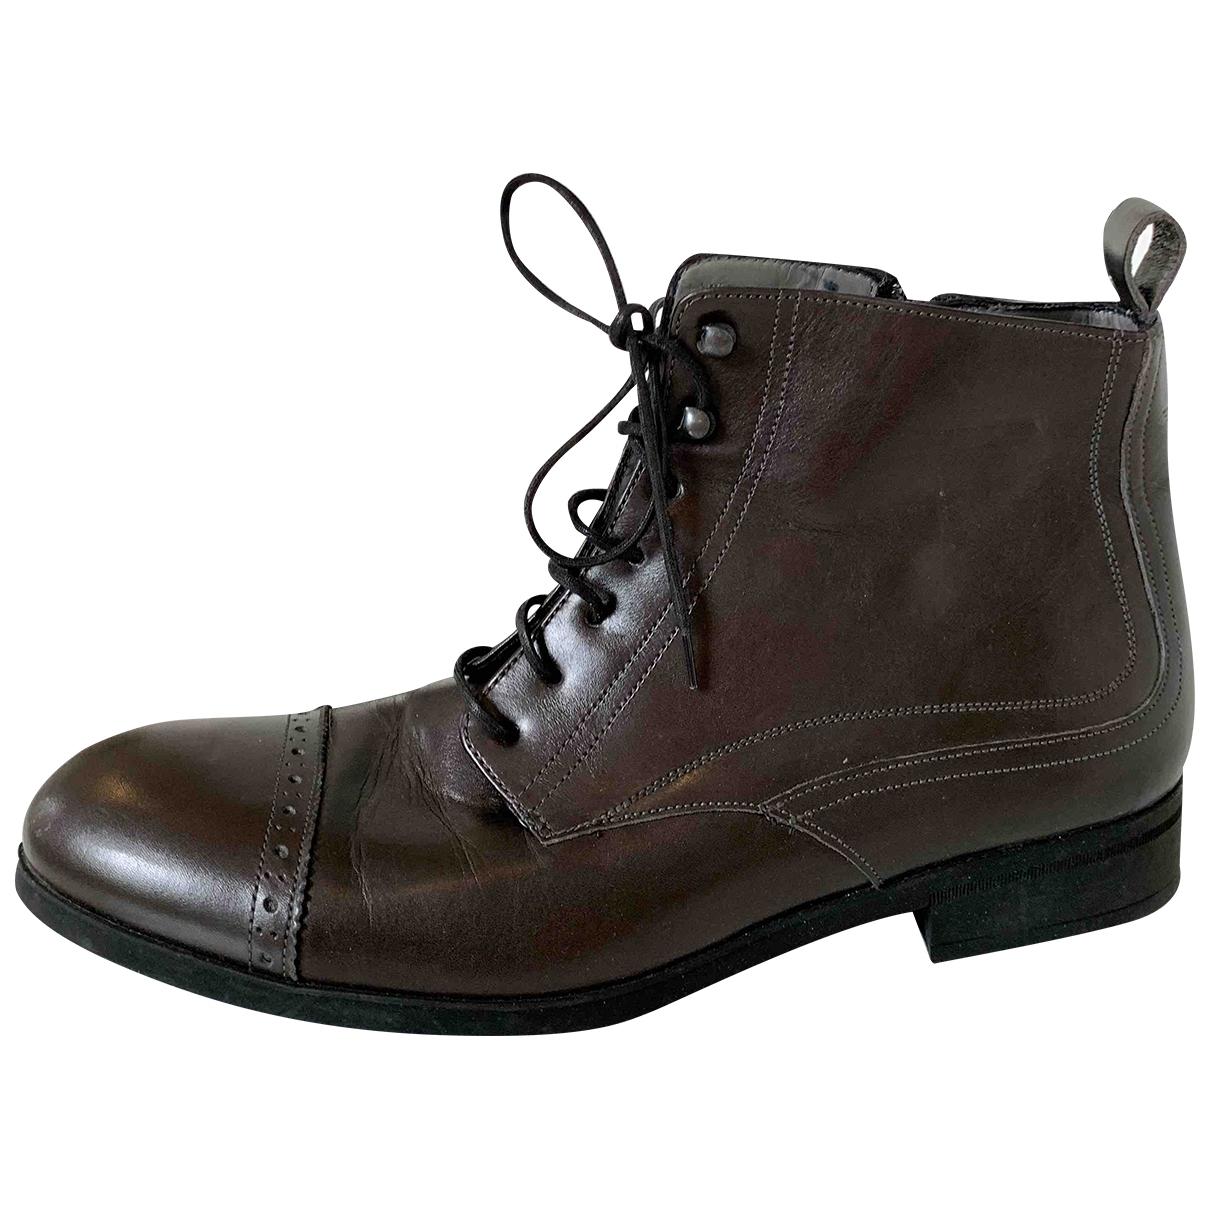 Emporio Armani \N Stiefel in  Braun Leder